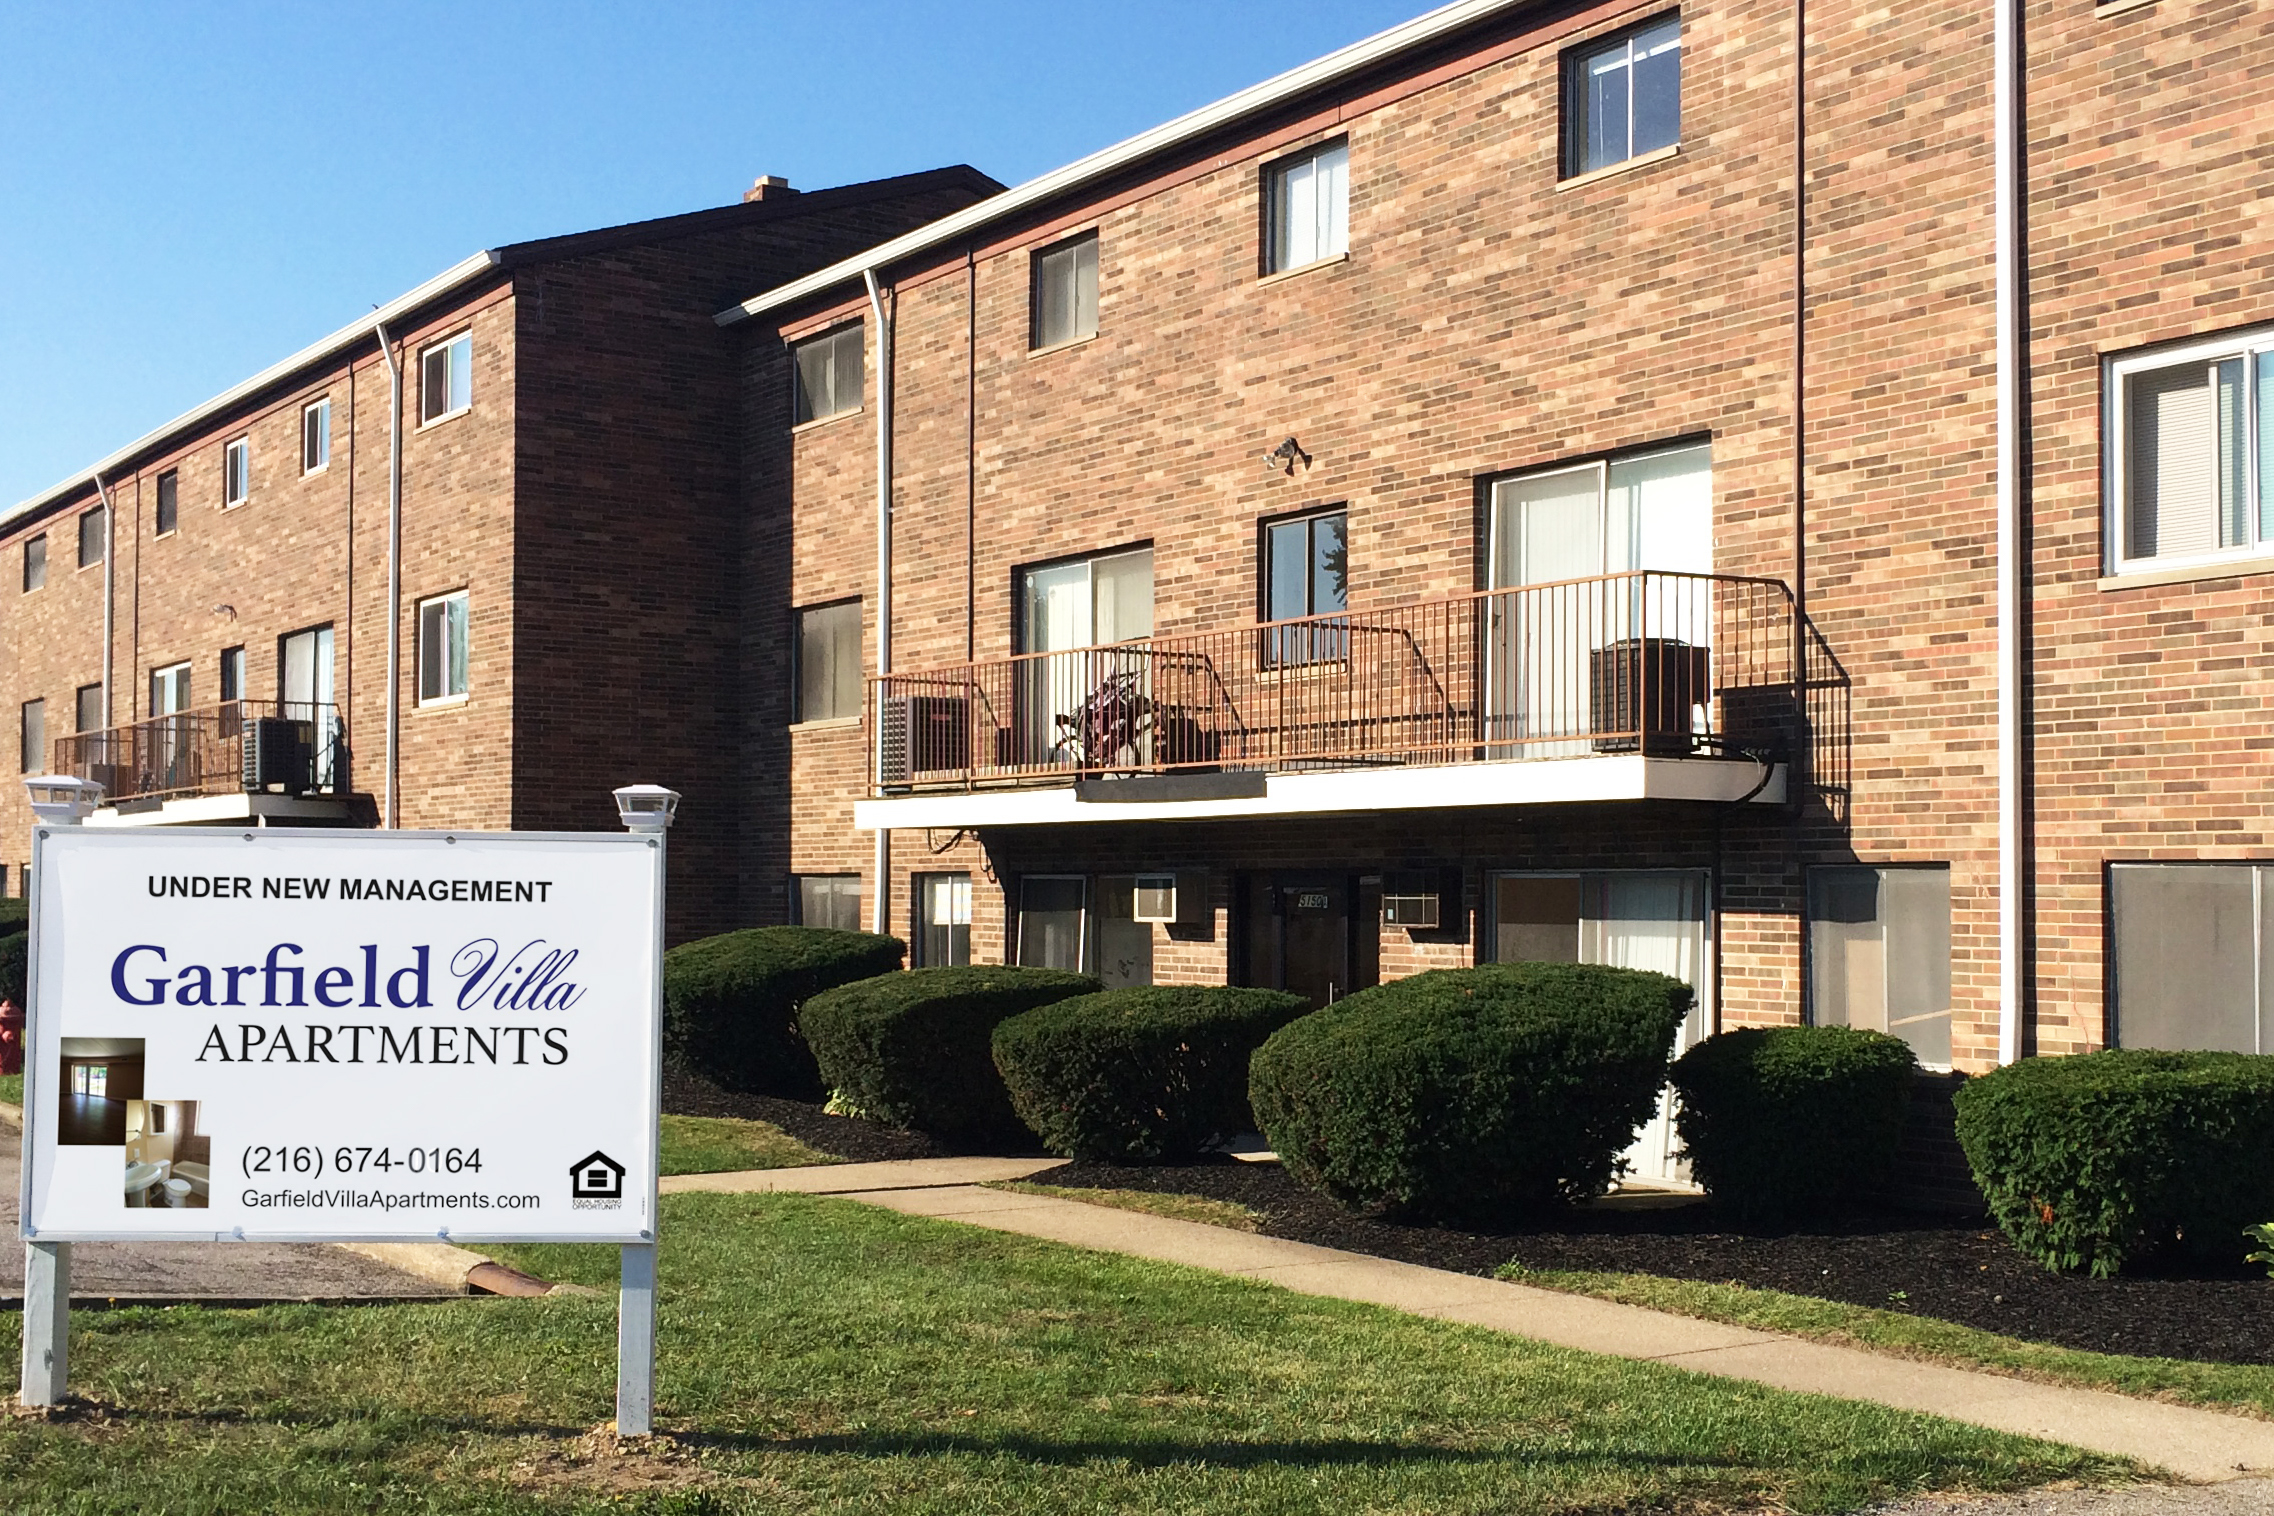 Garfield Villa Apartments - Garfield Heights, Ohio